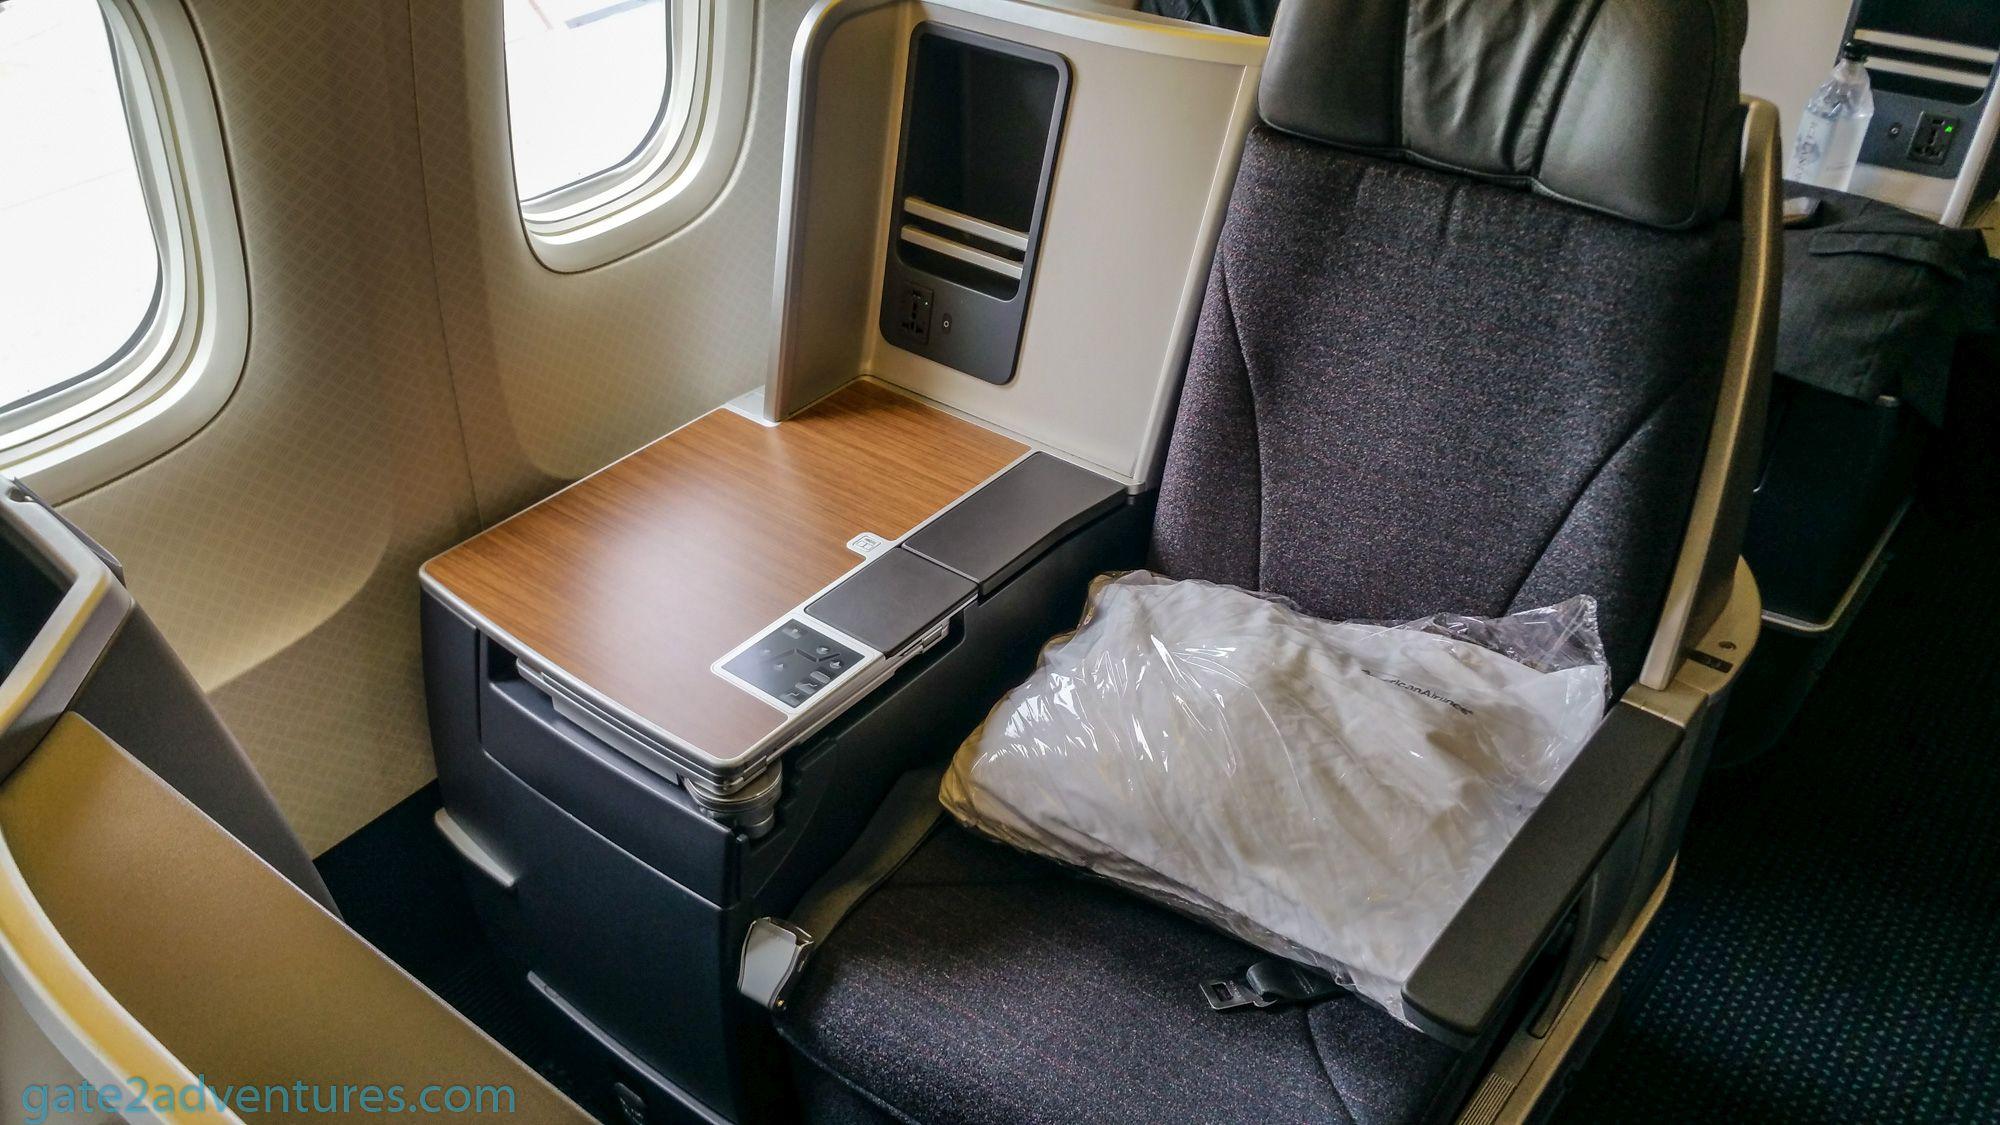 Flight Review: American Airlines Business Class – Boeing 767-300 New York (JFK) to Zurich, Switzerland (ZRH)